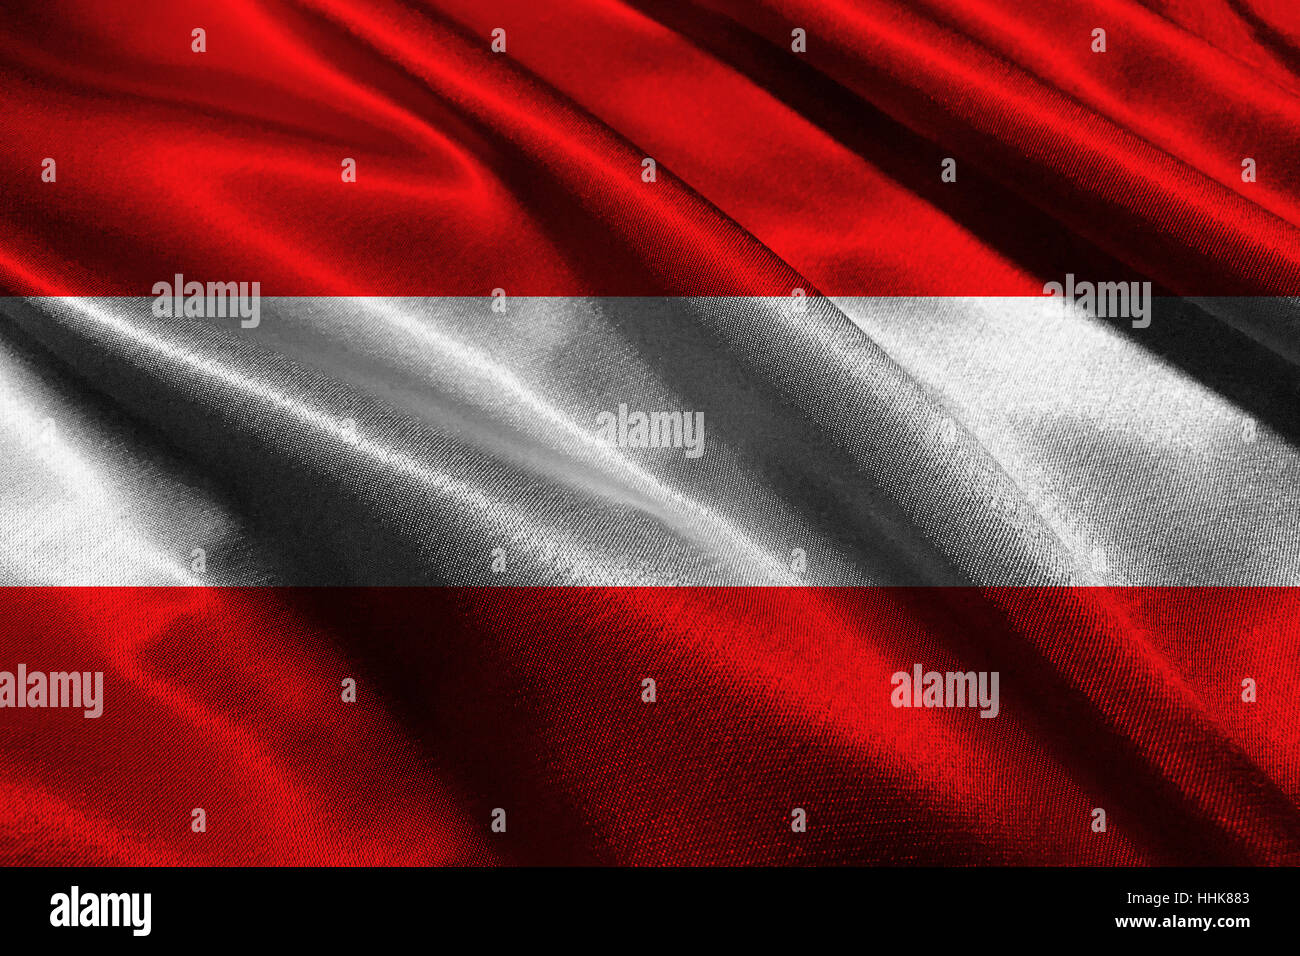 Austria flag ,Austria national flag 3D illustration symbol. - Stock Image